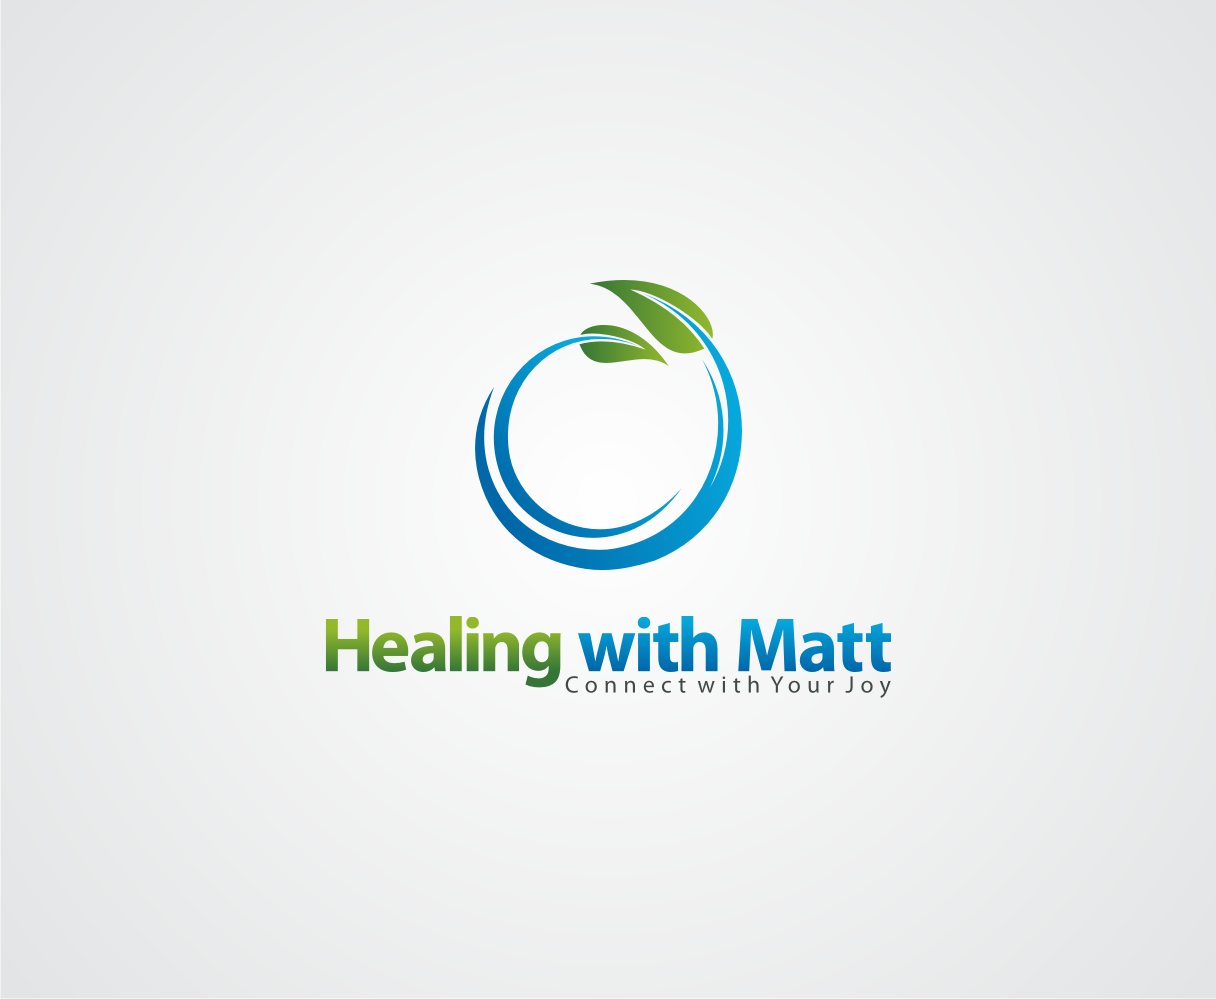 Logo Design by SonyArt - Entry No. 56 in the Logo Design Contest Captivating Logo Design for Healing with Matt.